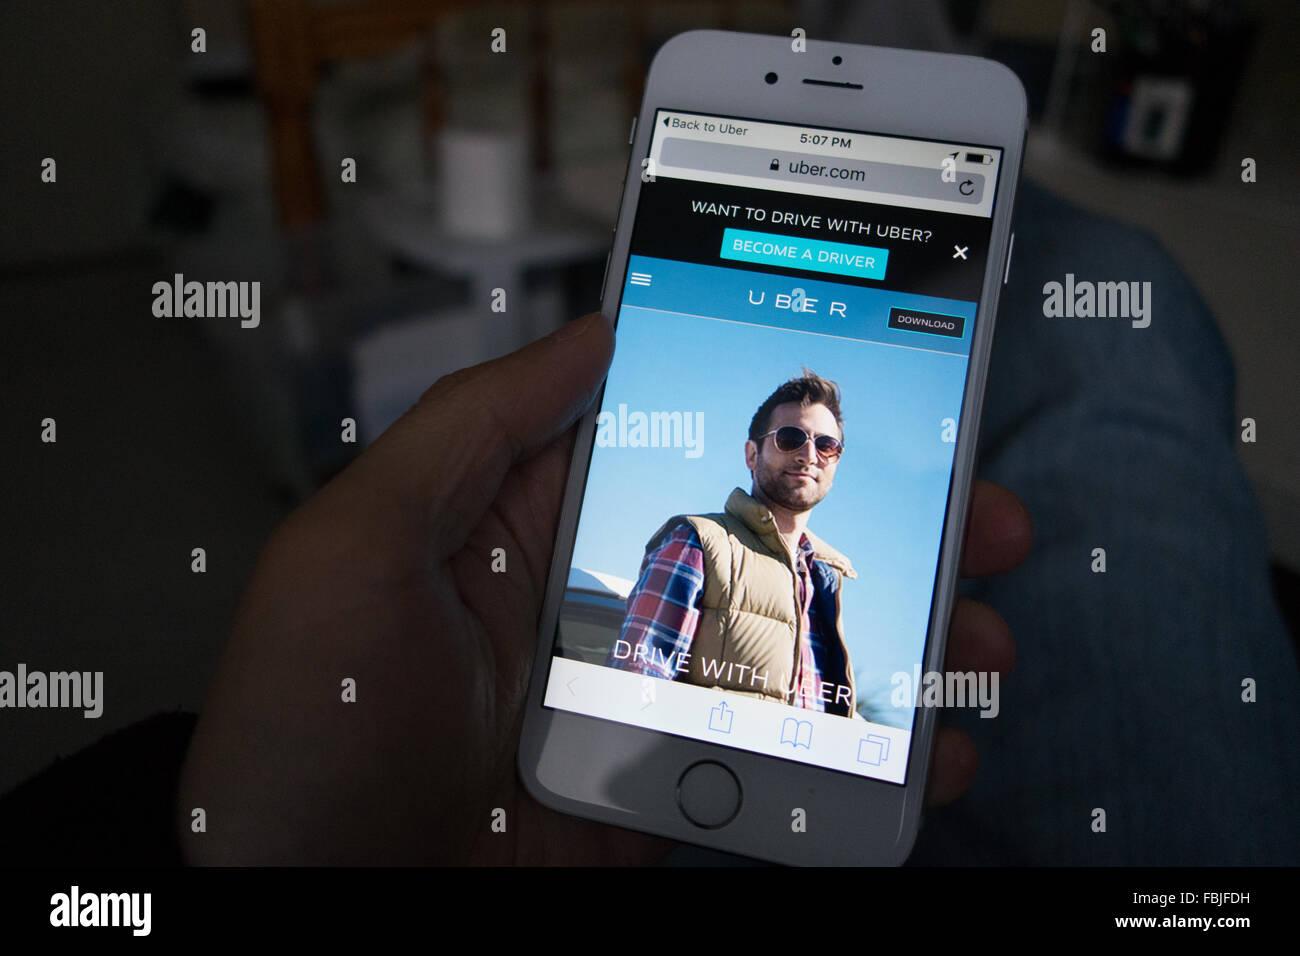 Compartir coche taxi app uber Imagen De Stock